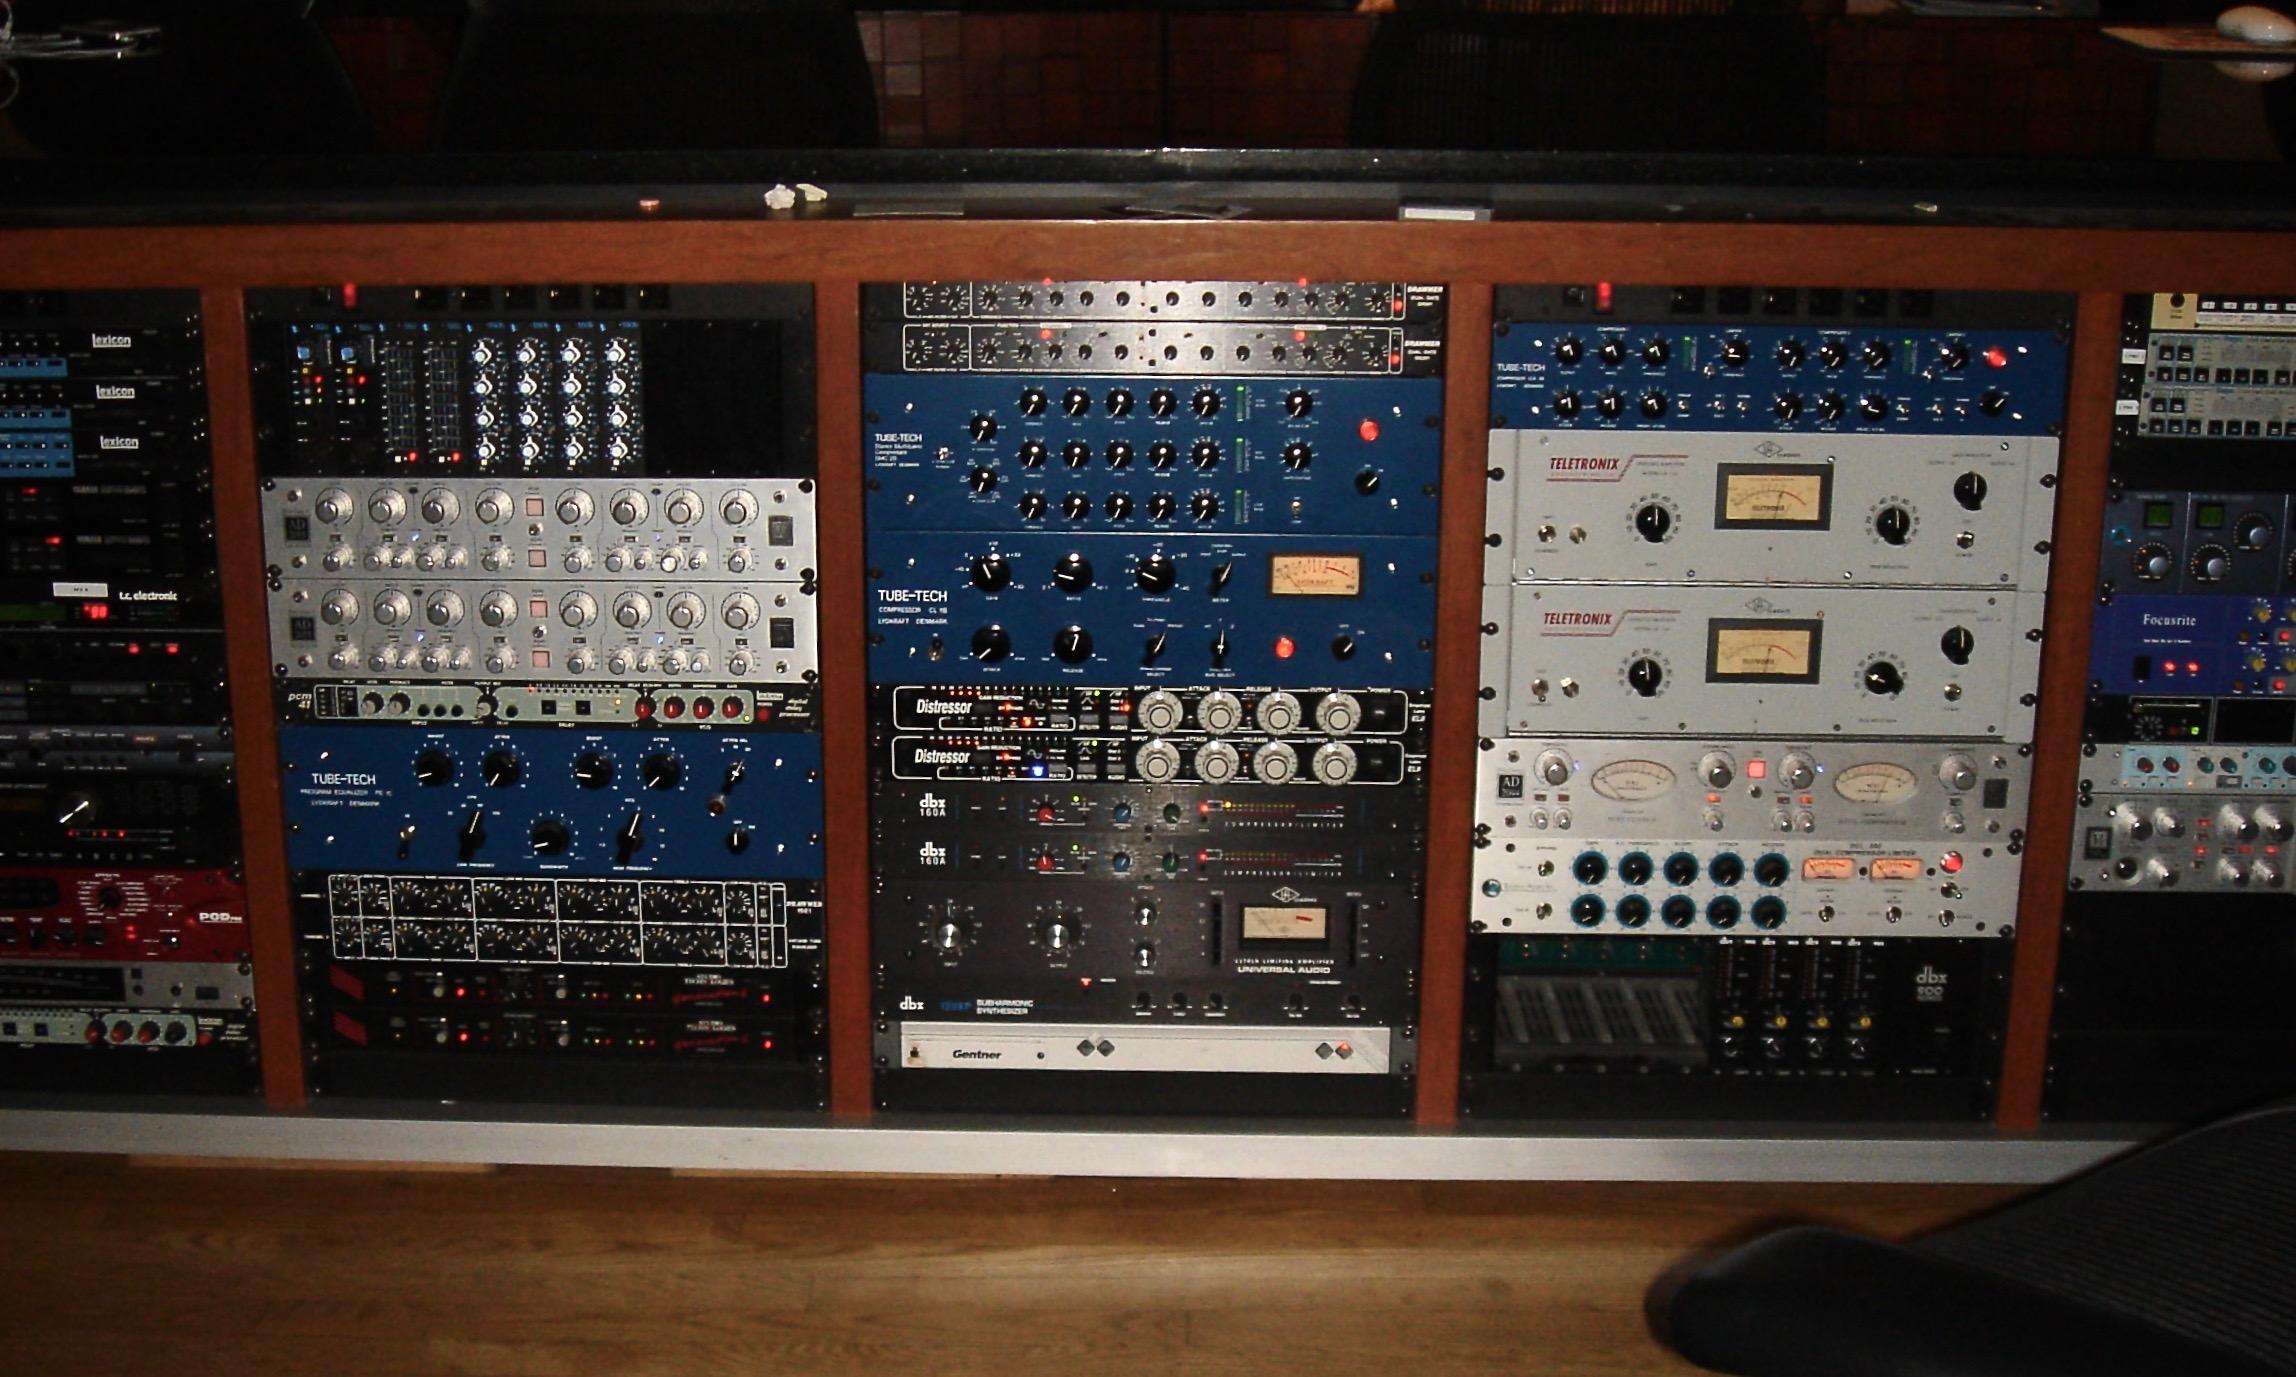 Outboard_racks_2-1,_PatchWerk_Recording_Studios,_2007